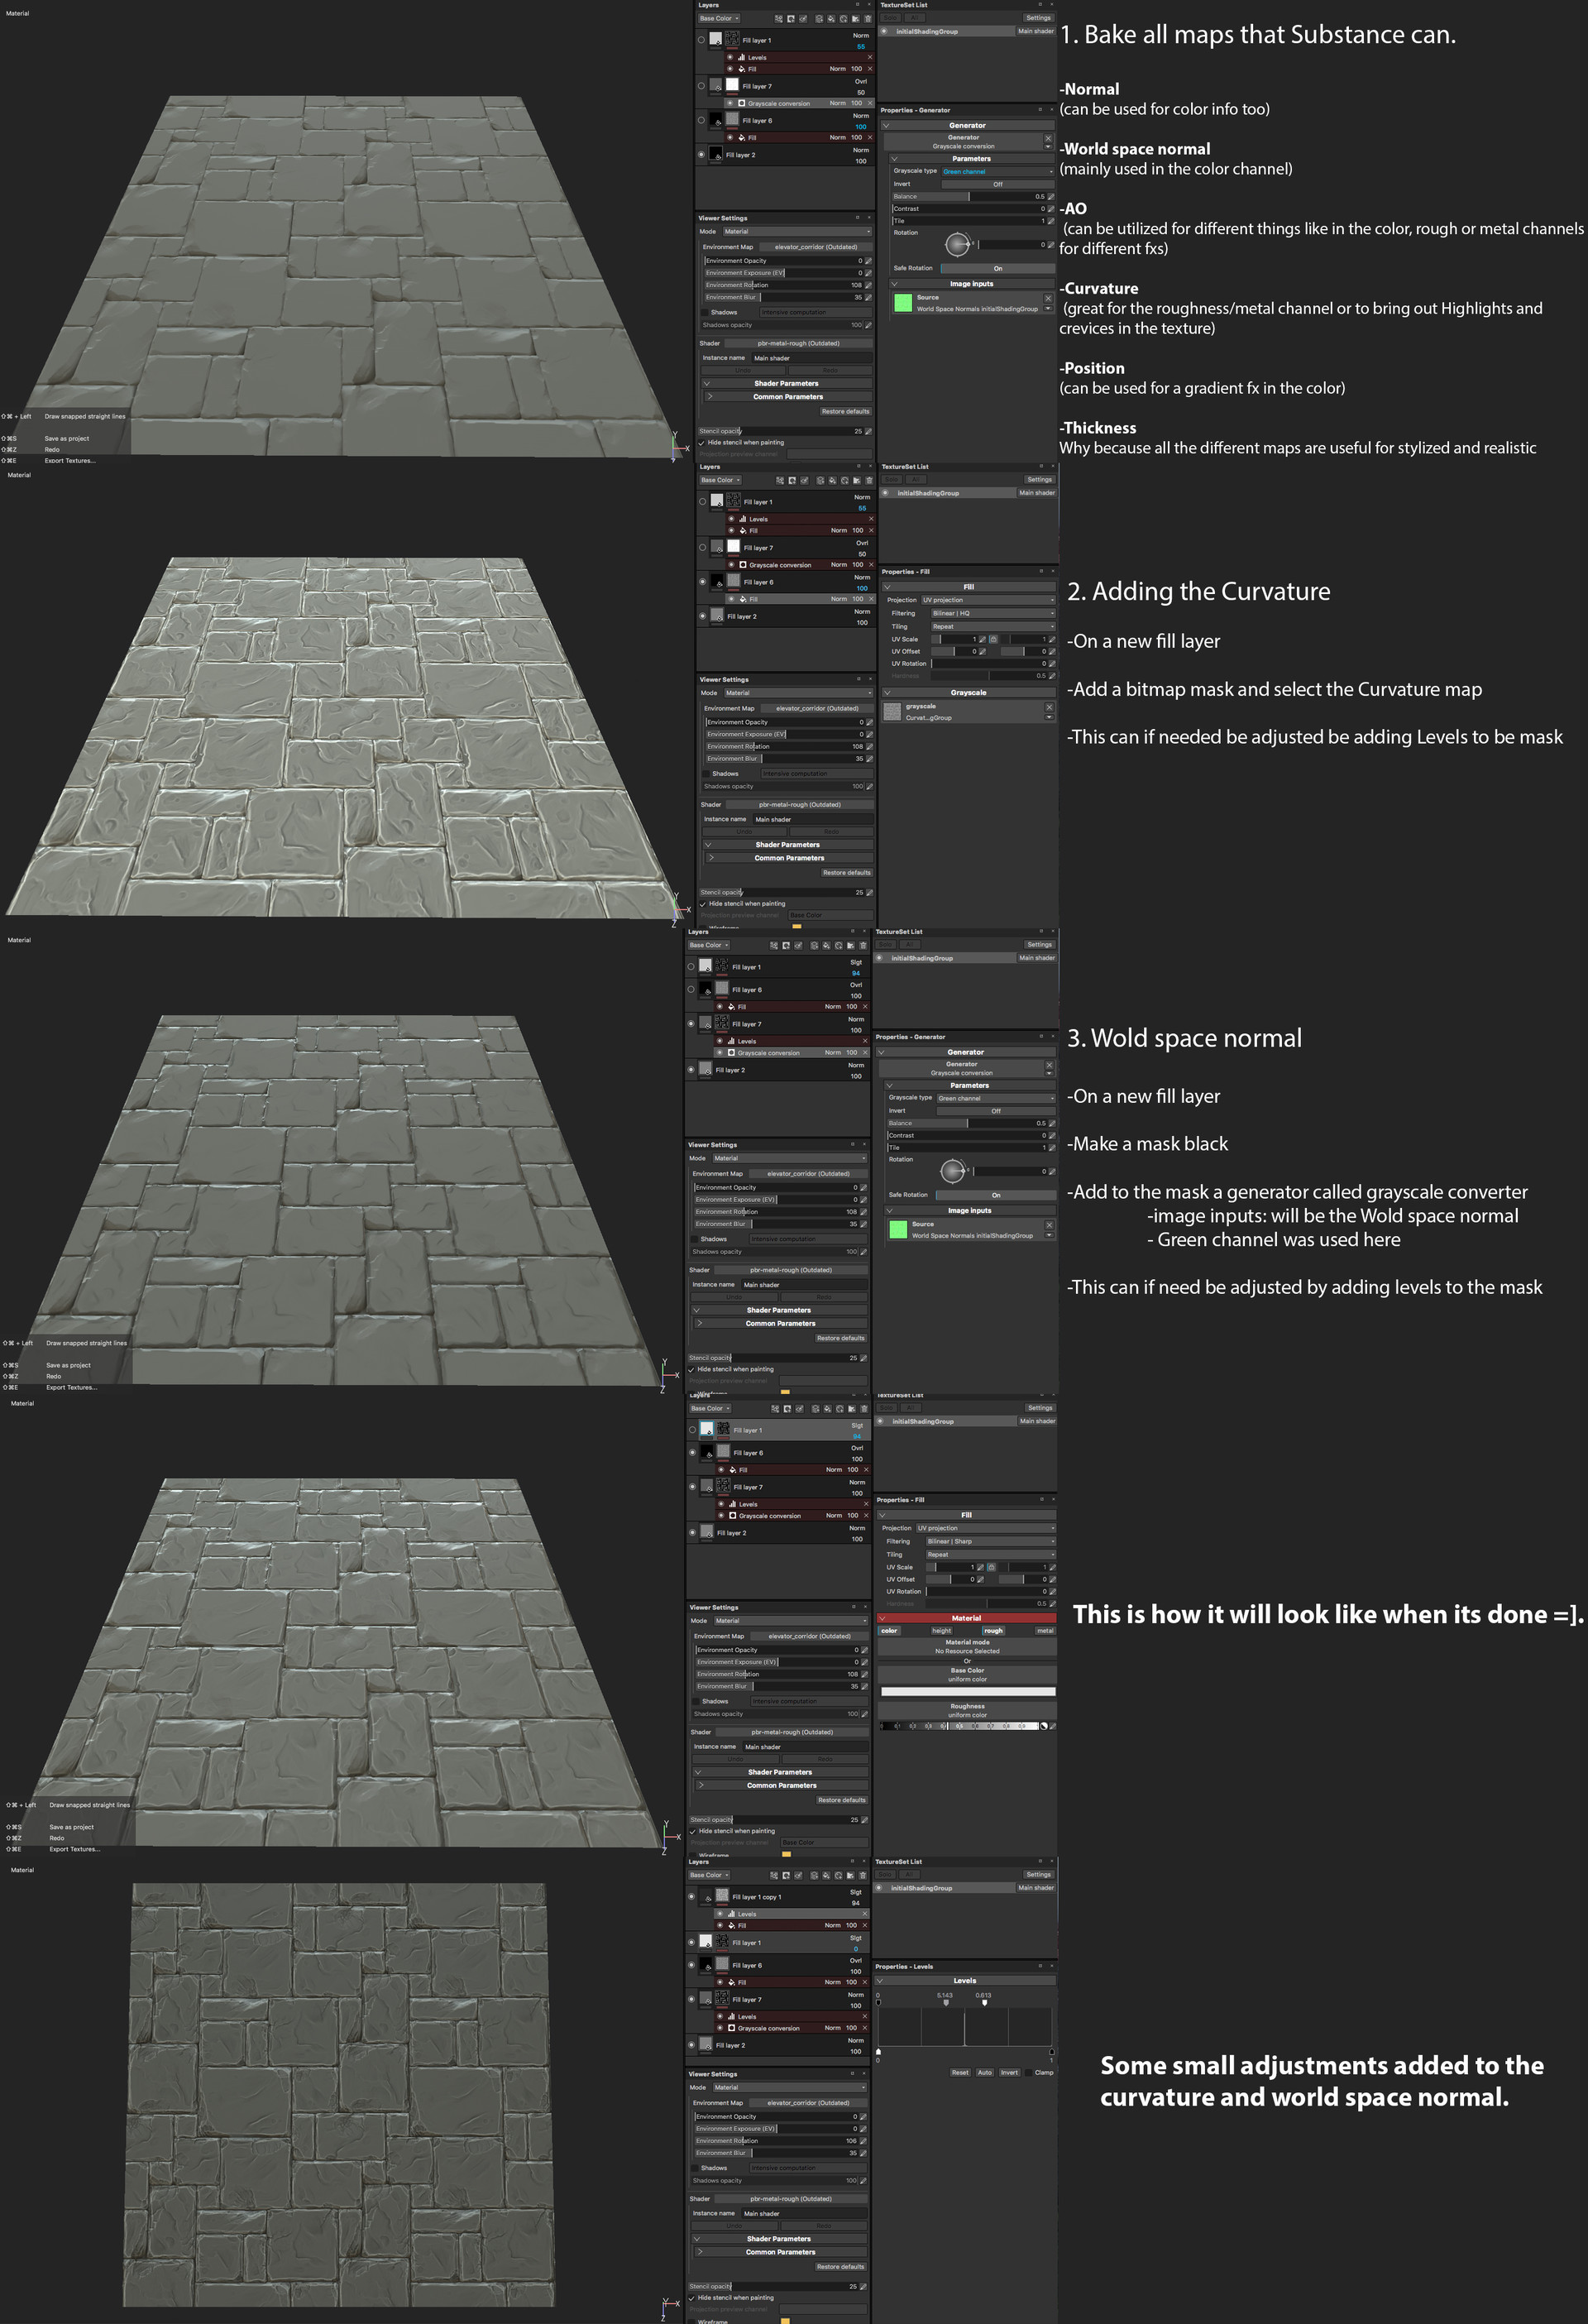 David washington chops layer texture beakdown